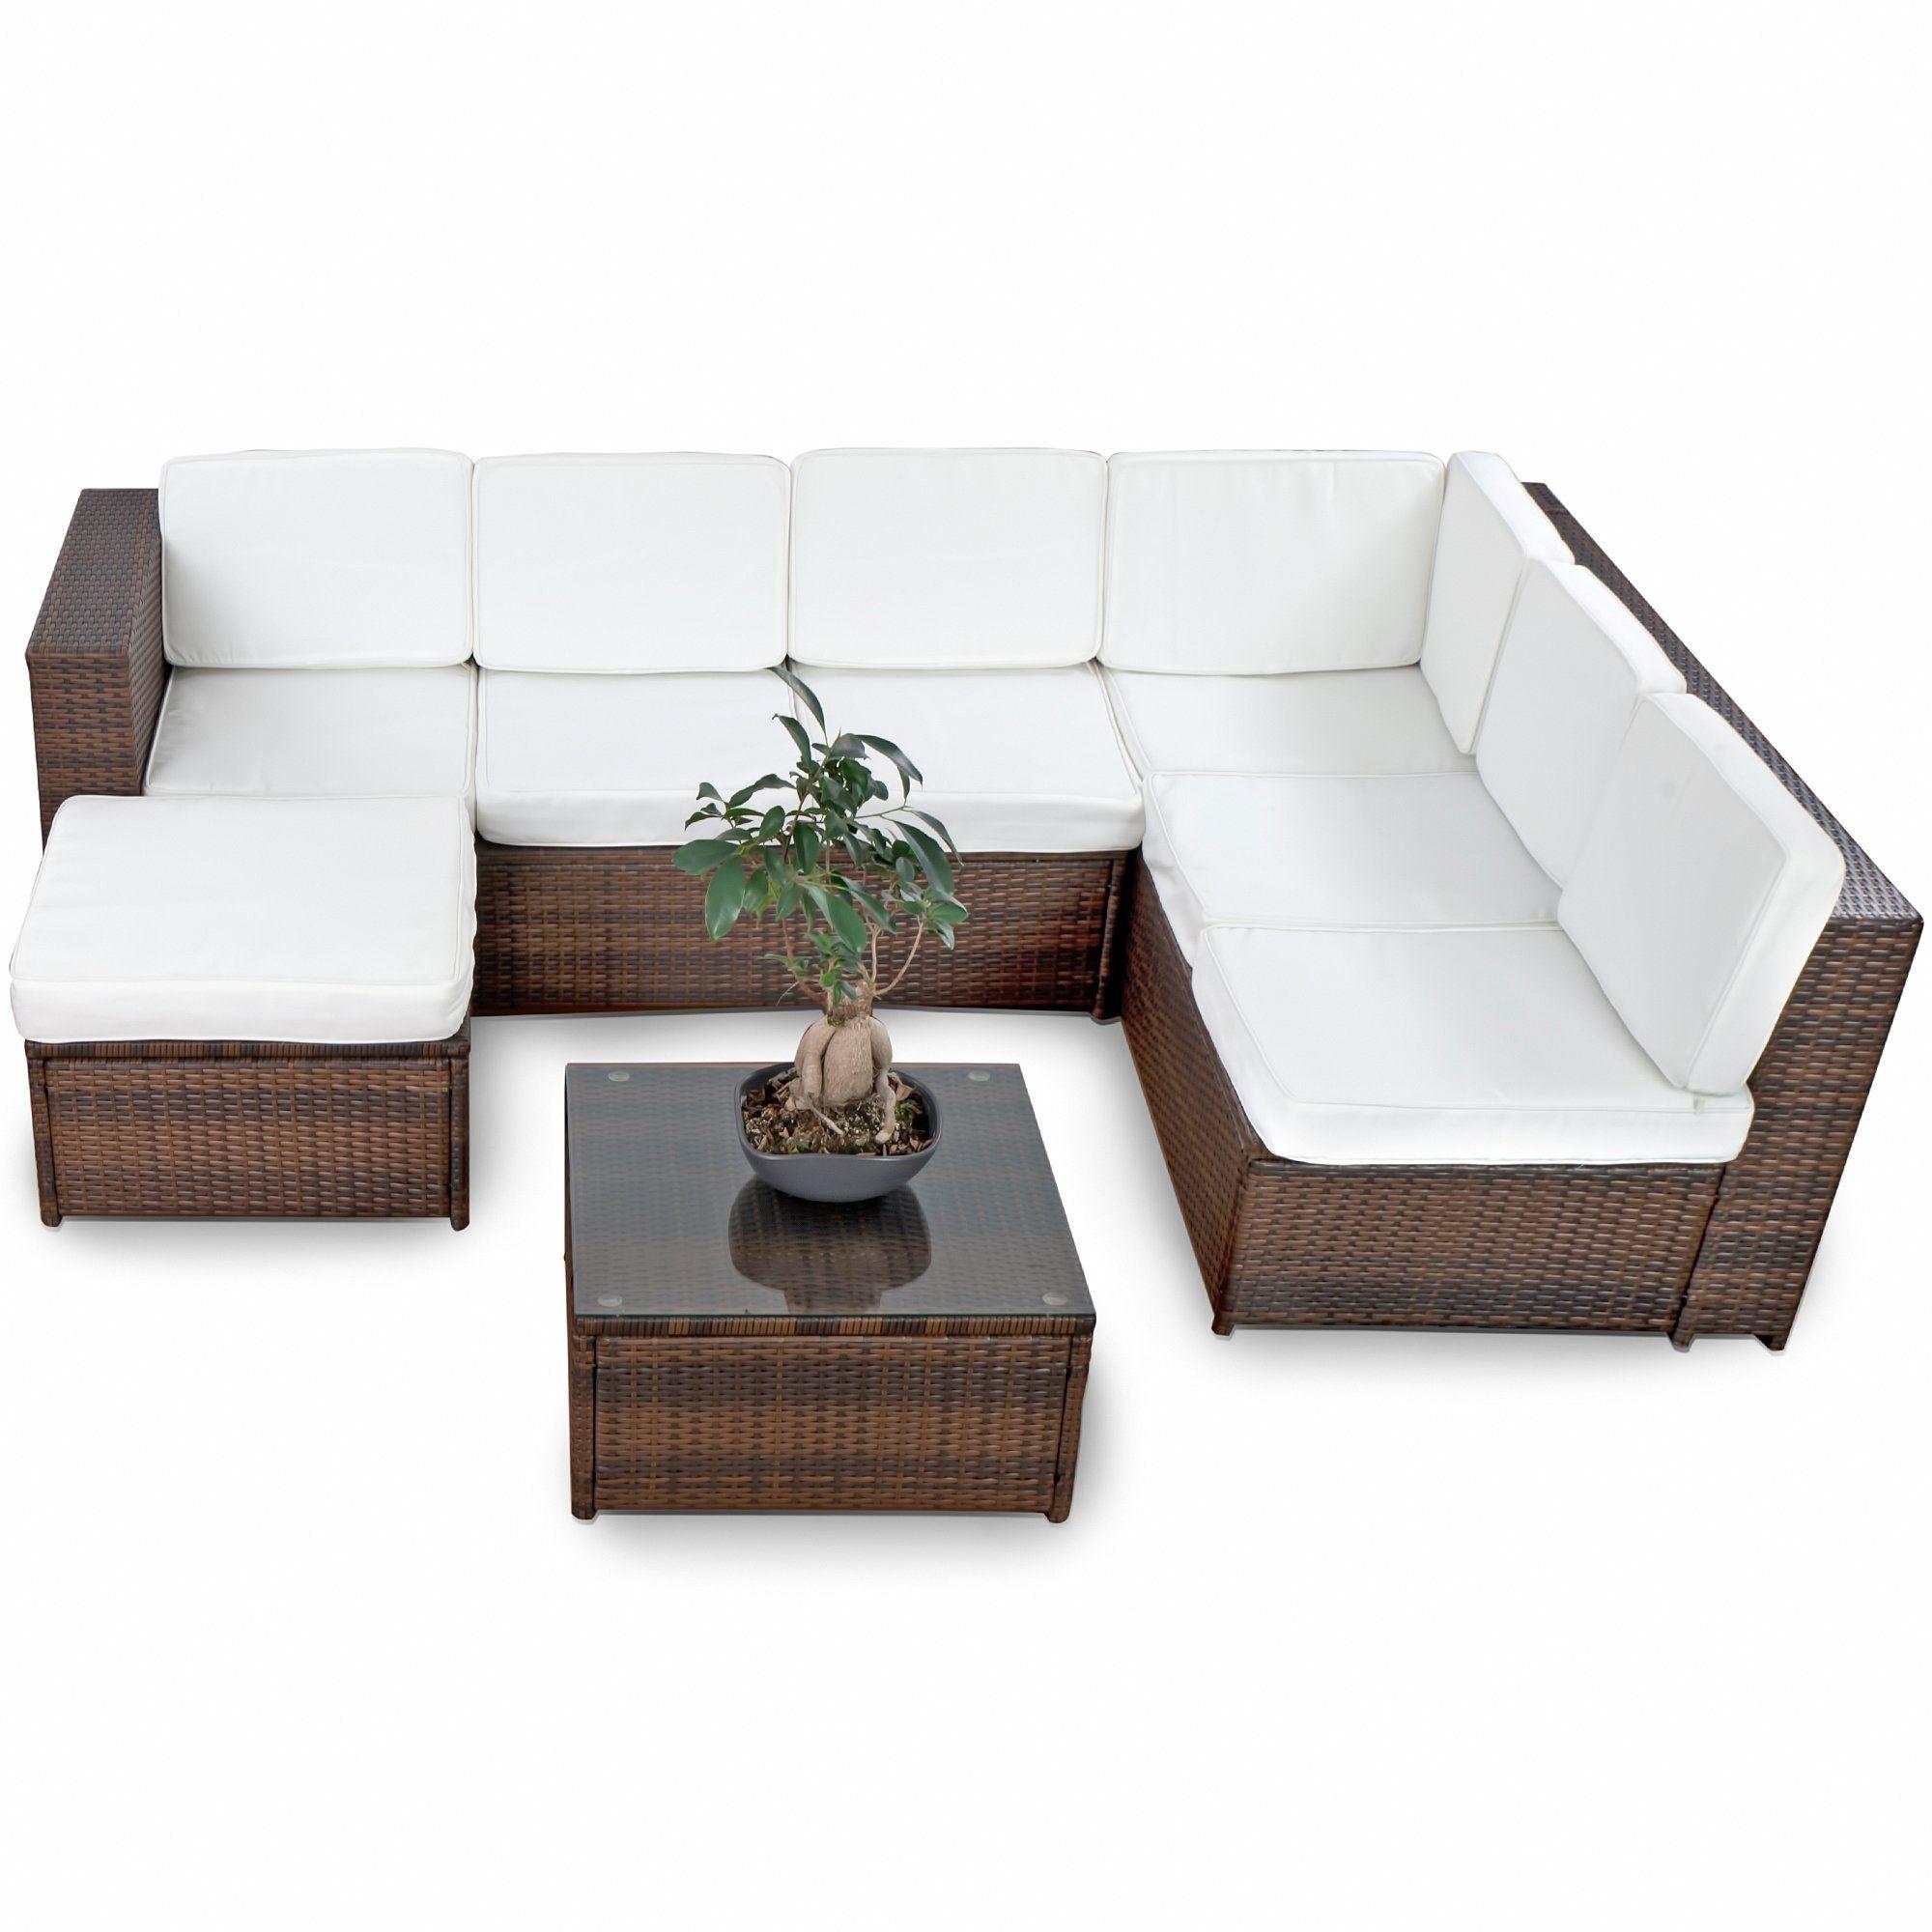 Xinro Tlg Xxxl Polyrattan Gartenmobel Lounge Sofa Gunstig Lounge Mobel Lounge Set Polyrattan Rattan Garnitur